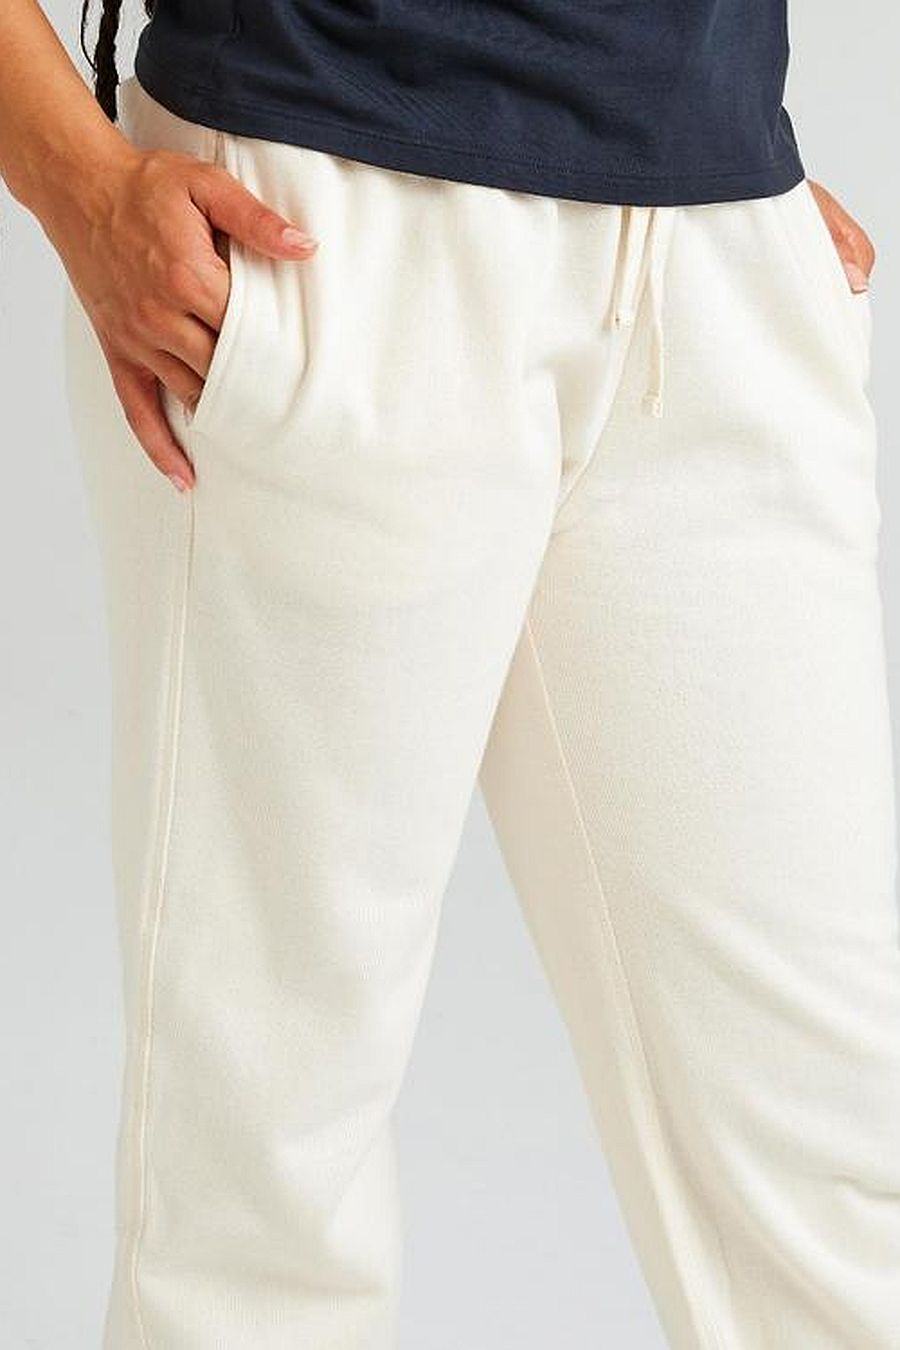 Richer Poorer Recycled Fleece Sweatpant - Bone